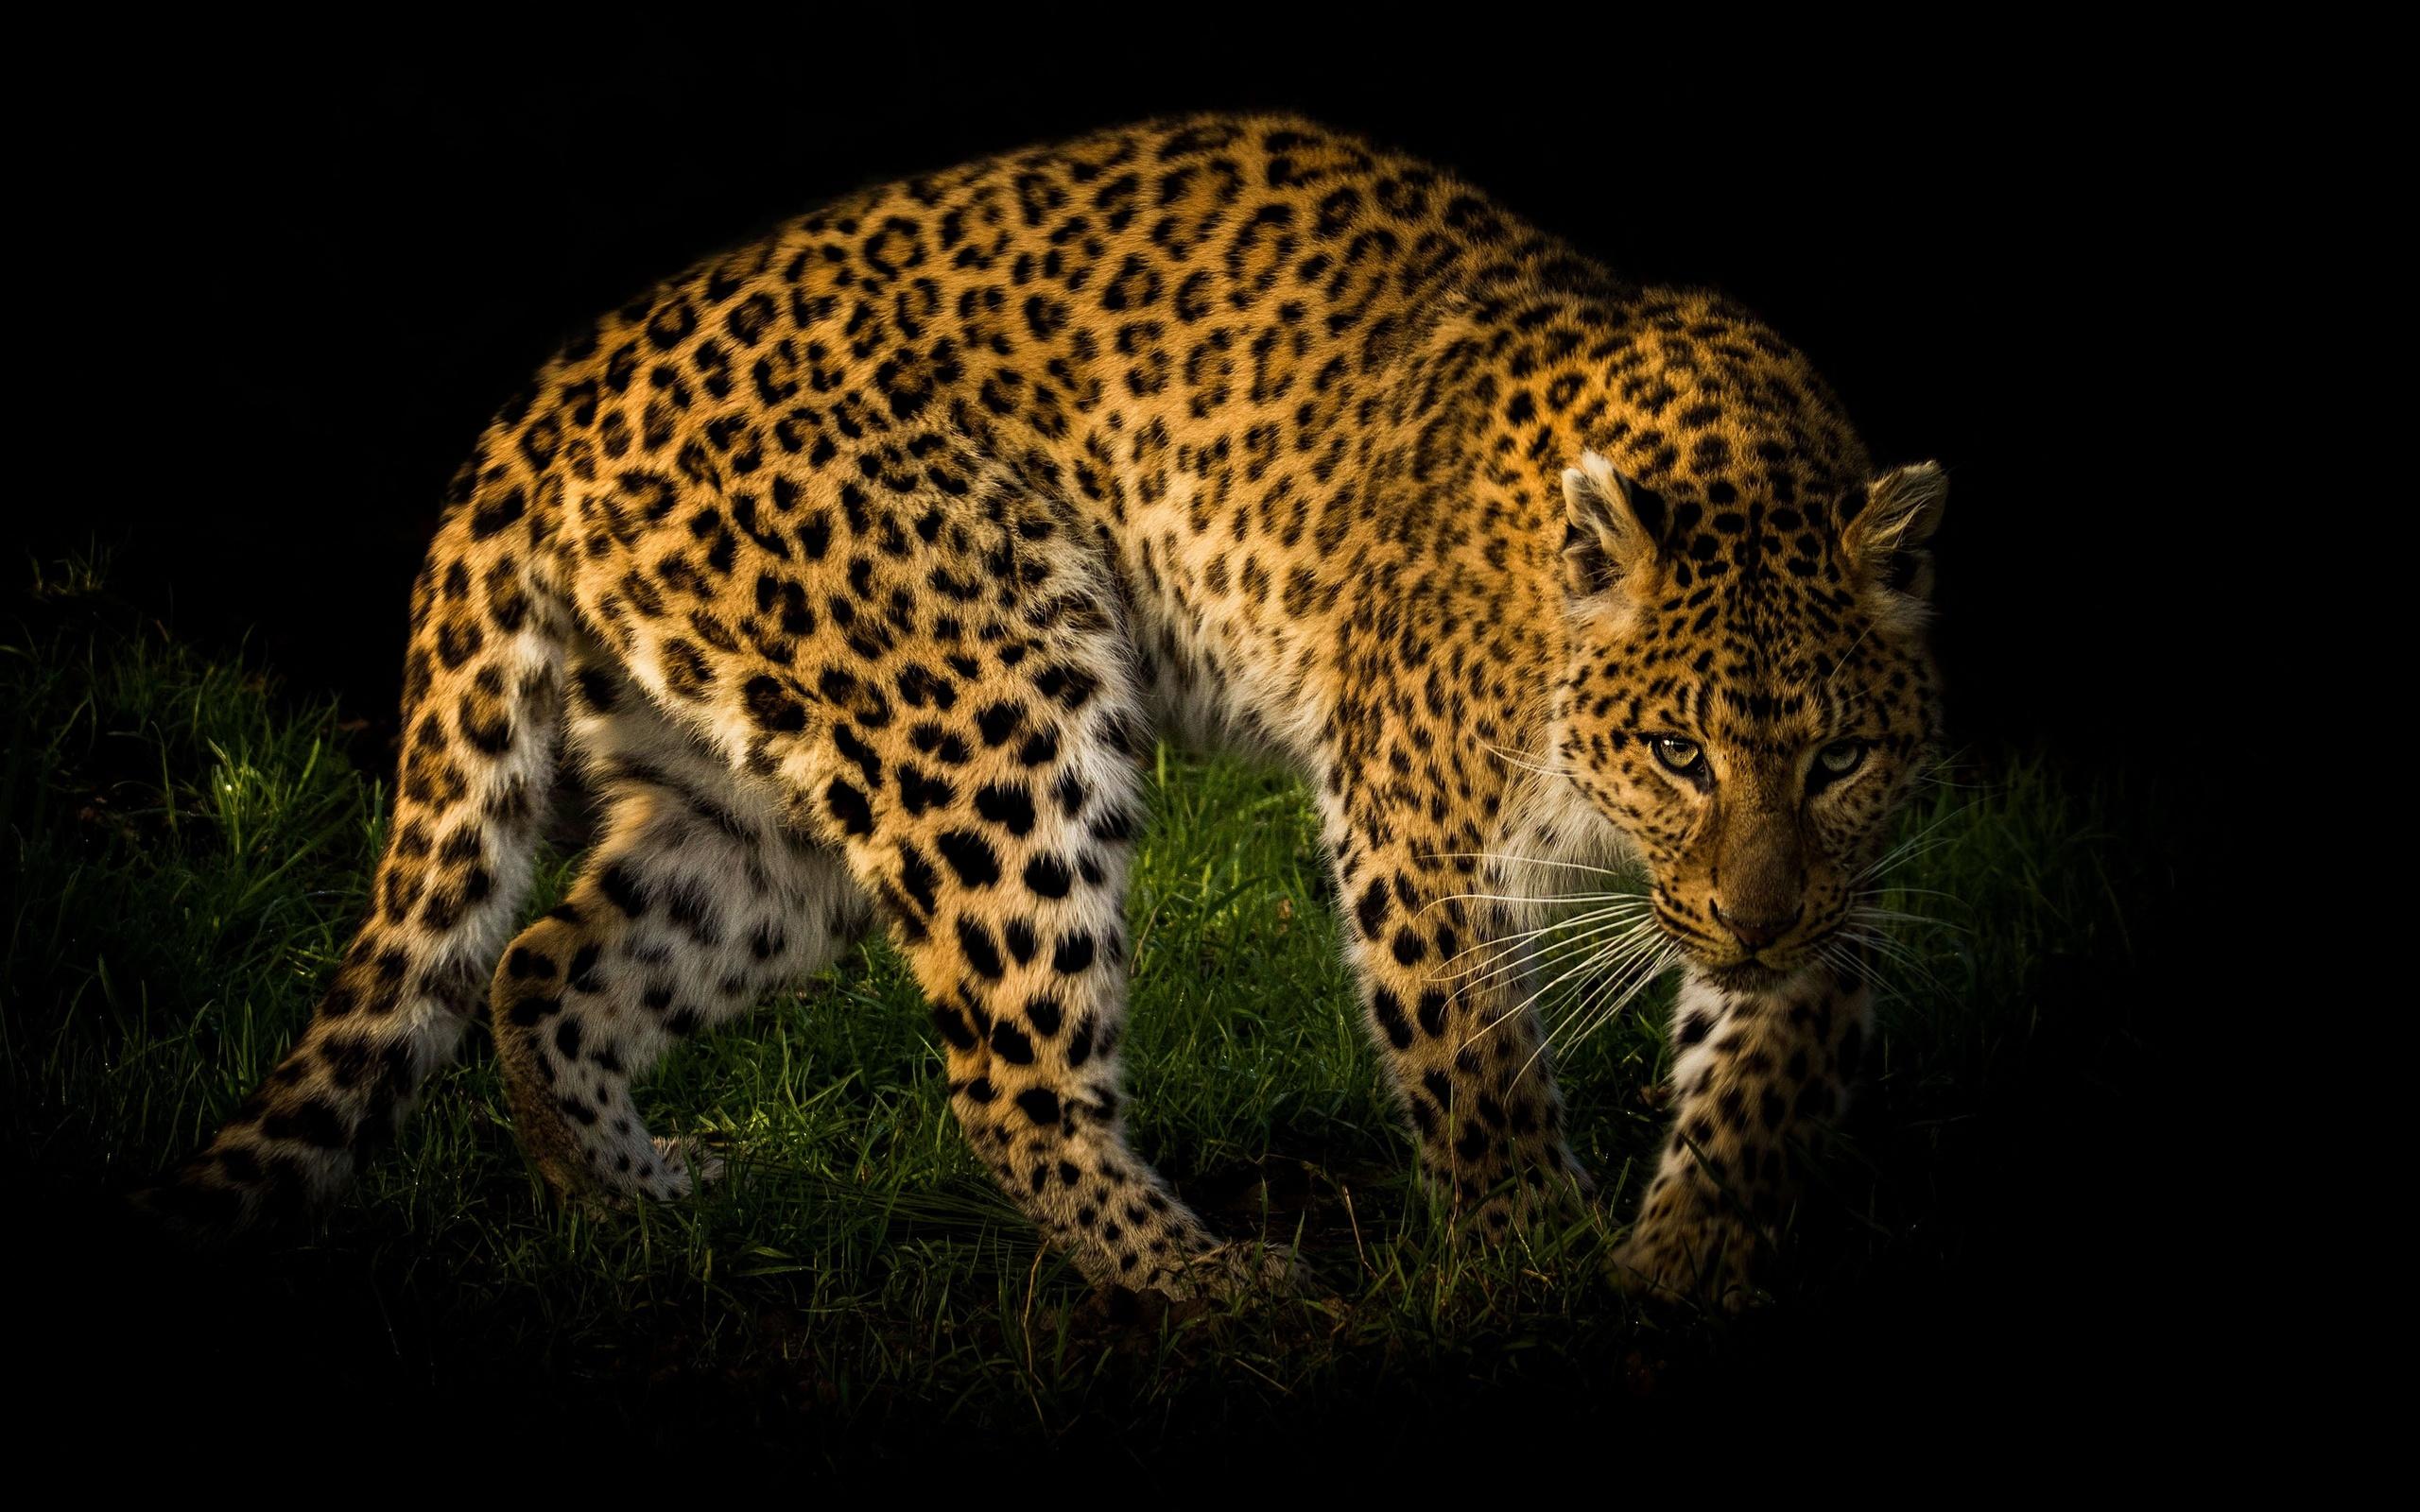 леопард, взгляд, животные